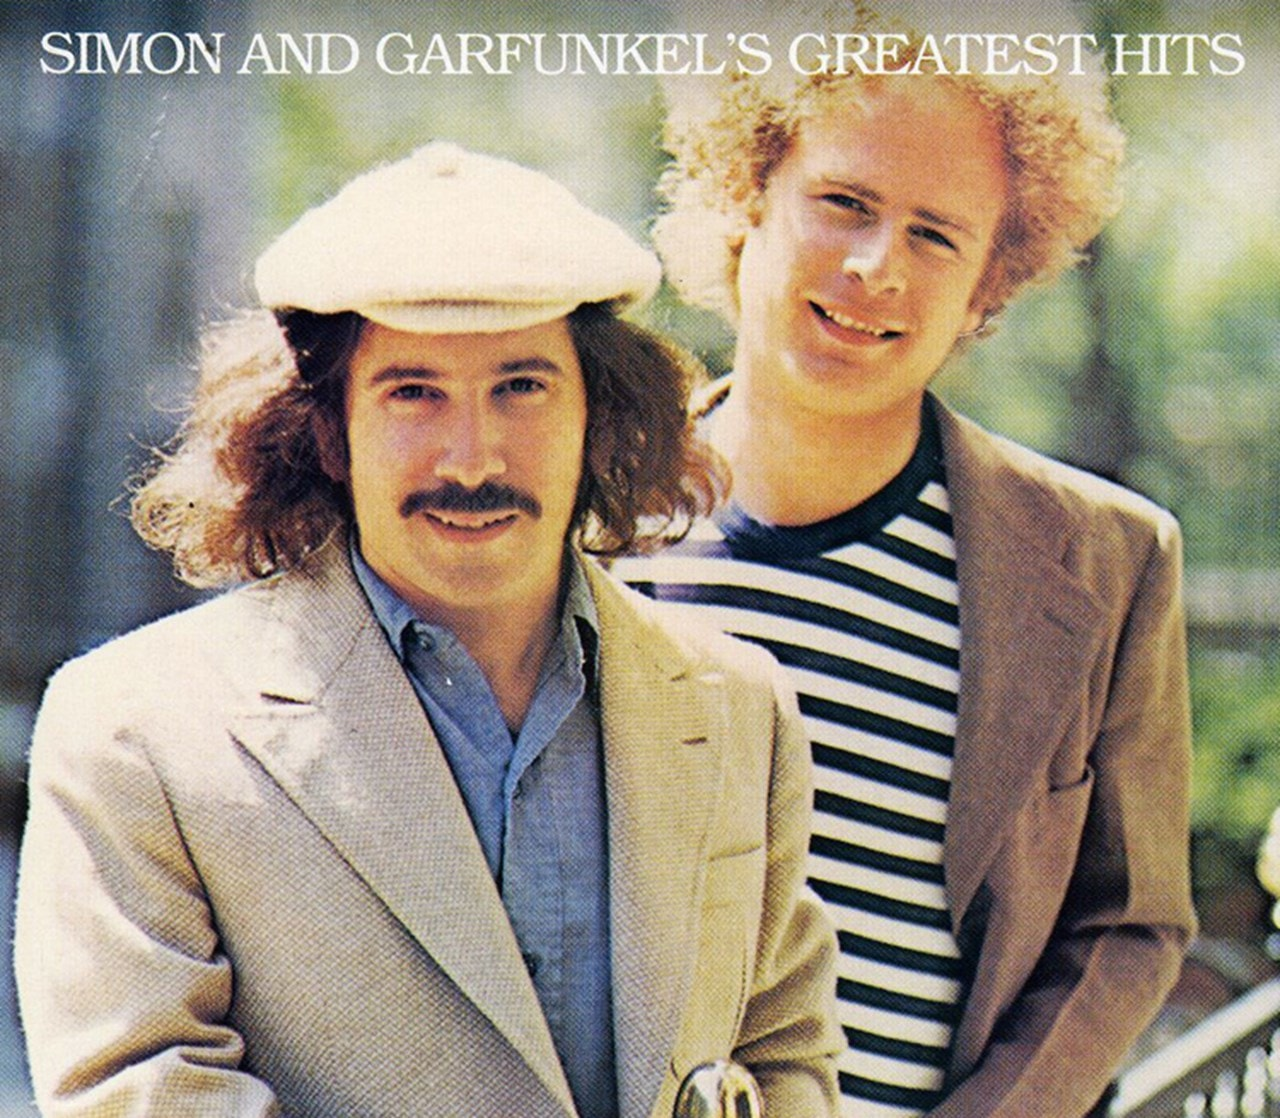 Simon & Garfunkel's Greatest Hits - 1